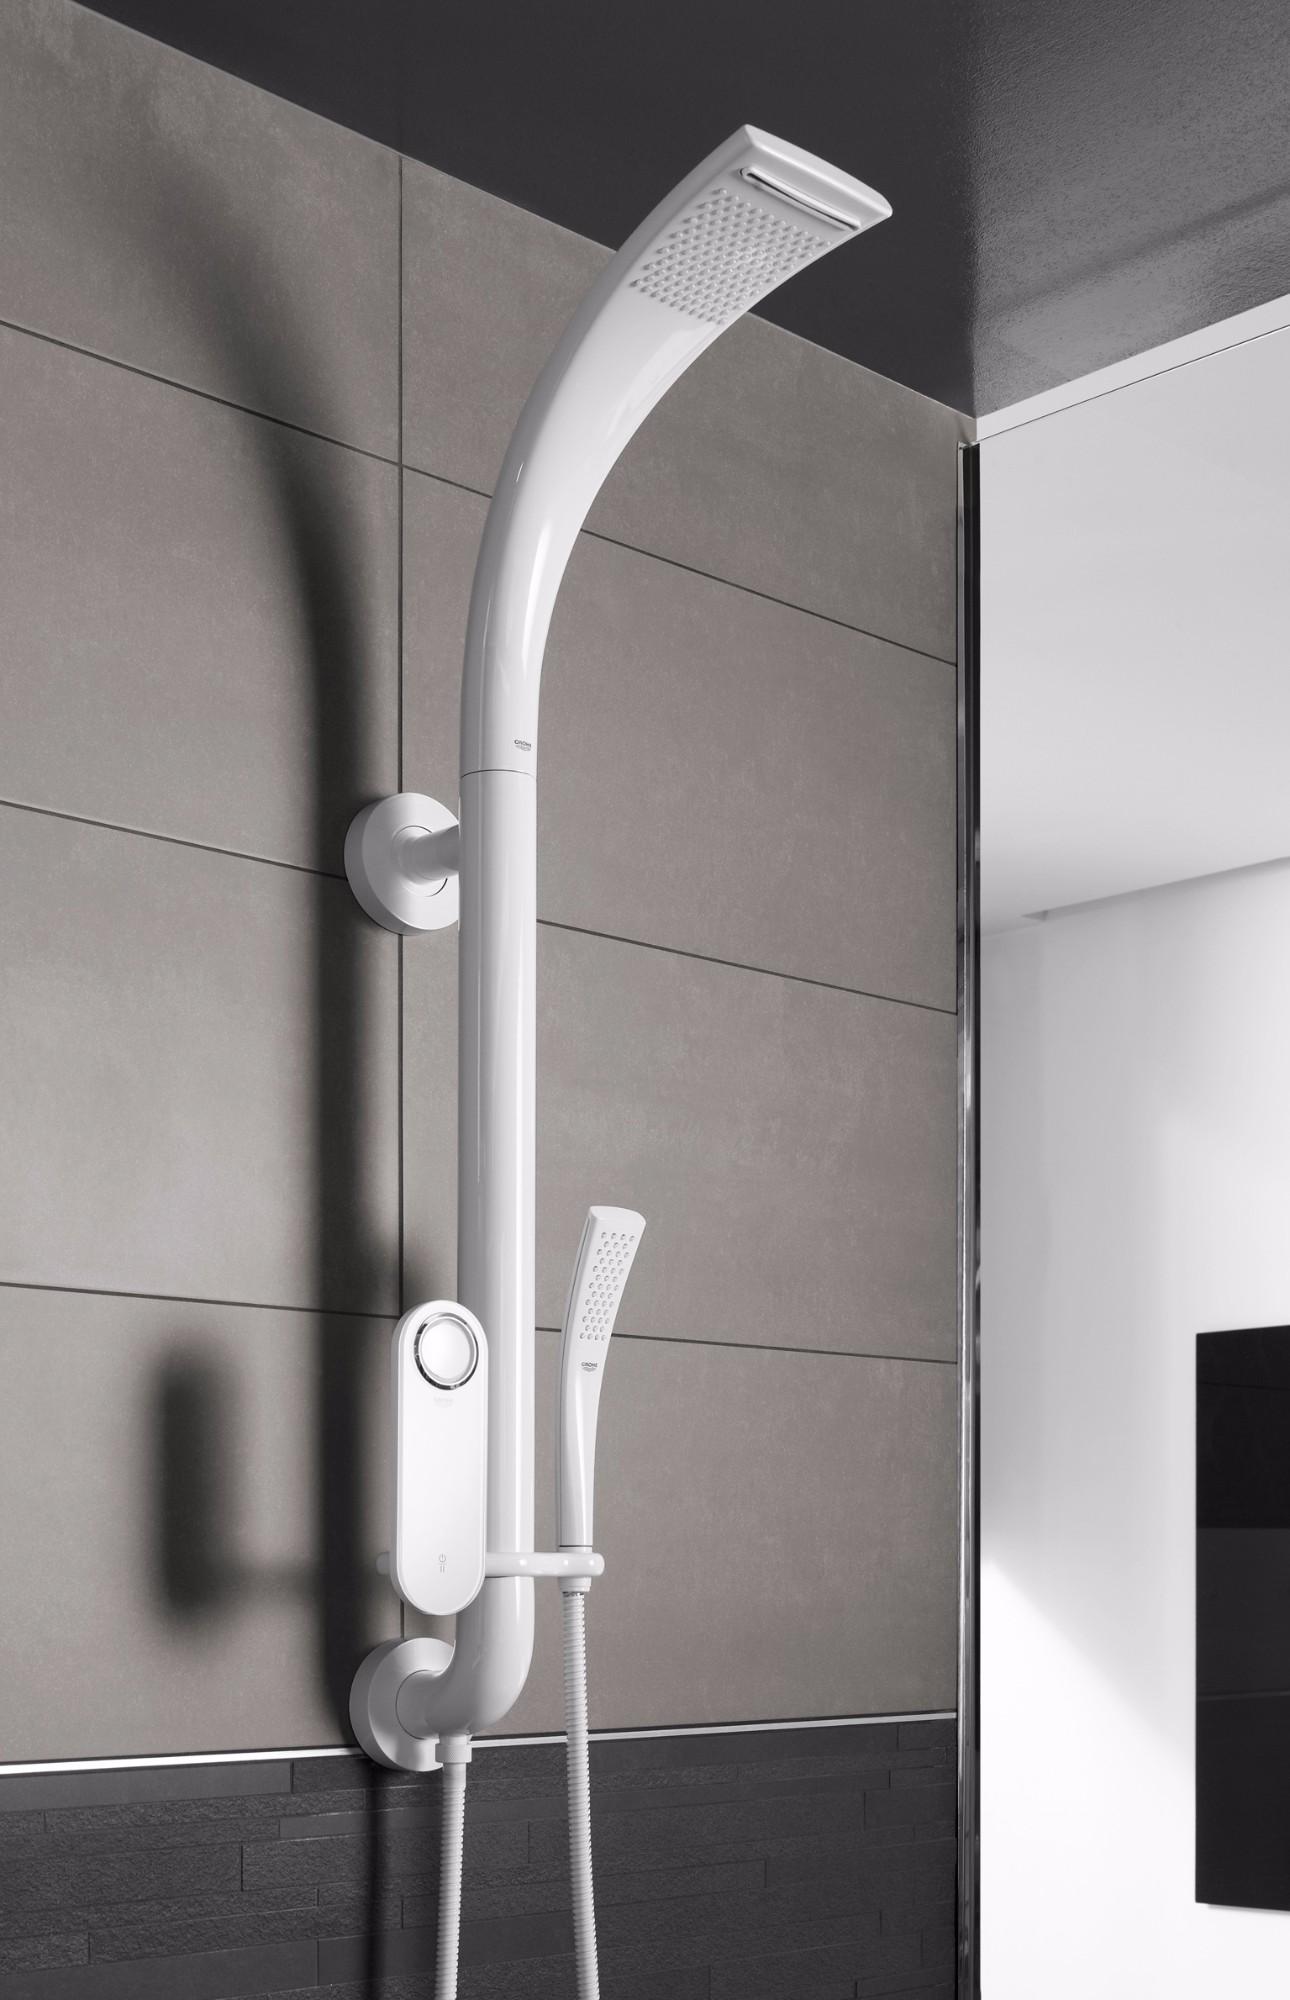 i rint ateit m s vonios kambariai 2034. Black Bedroom Furniture Sets. Home Design Ideas